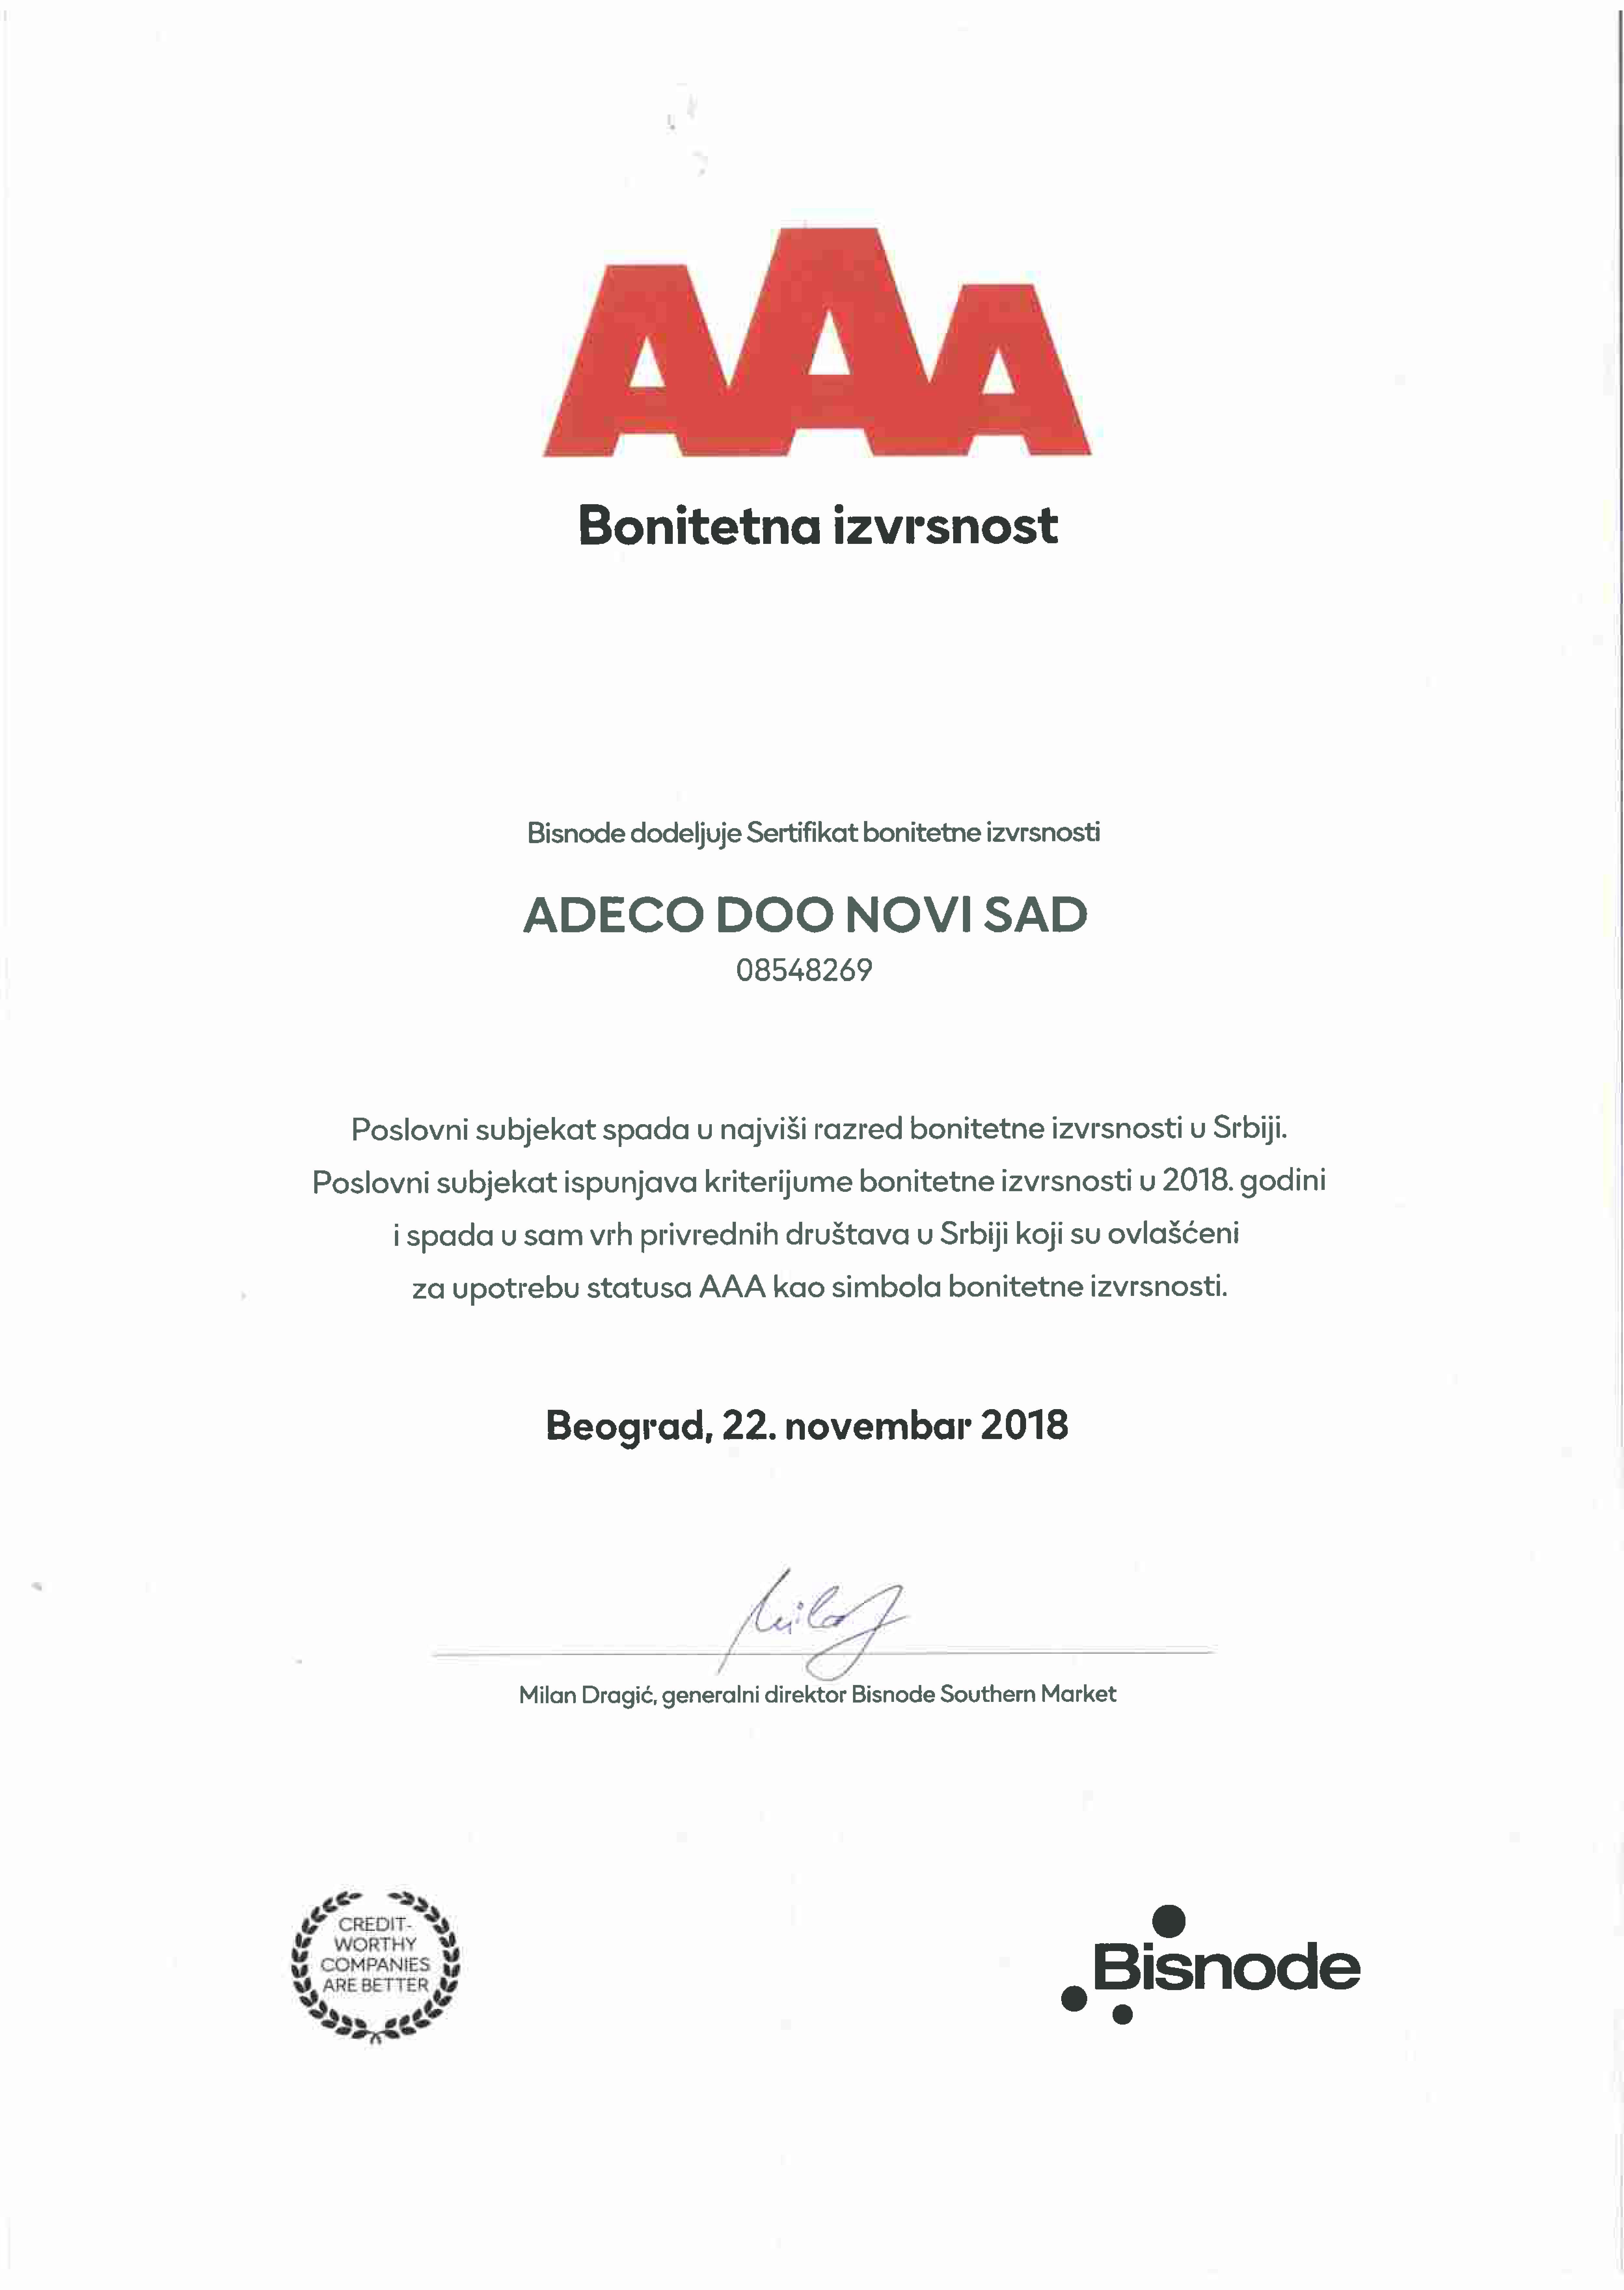 Sertifikat bonitetne izvrsnosti AAA